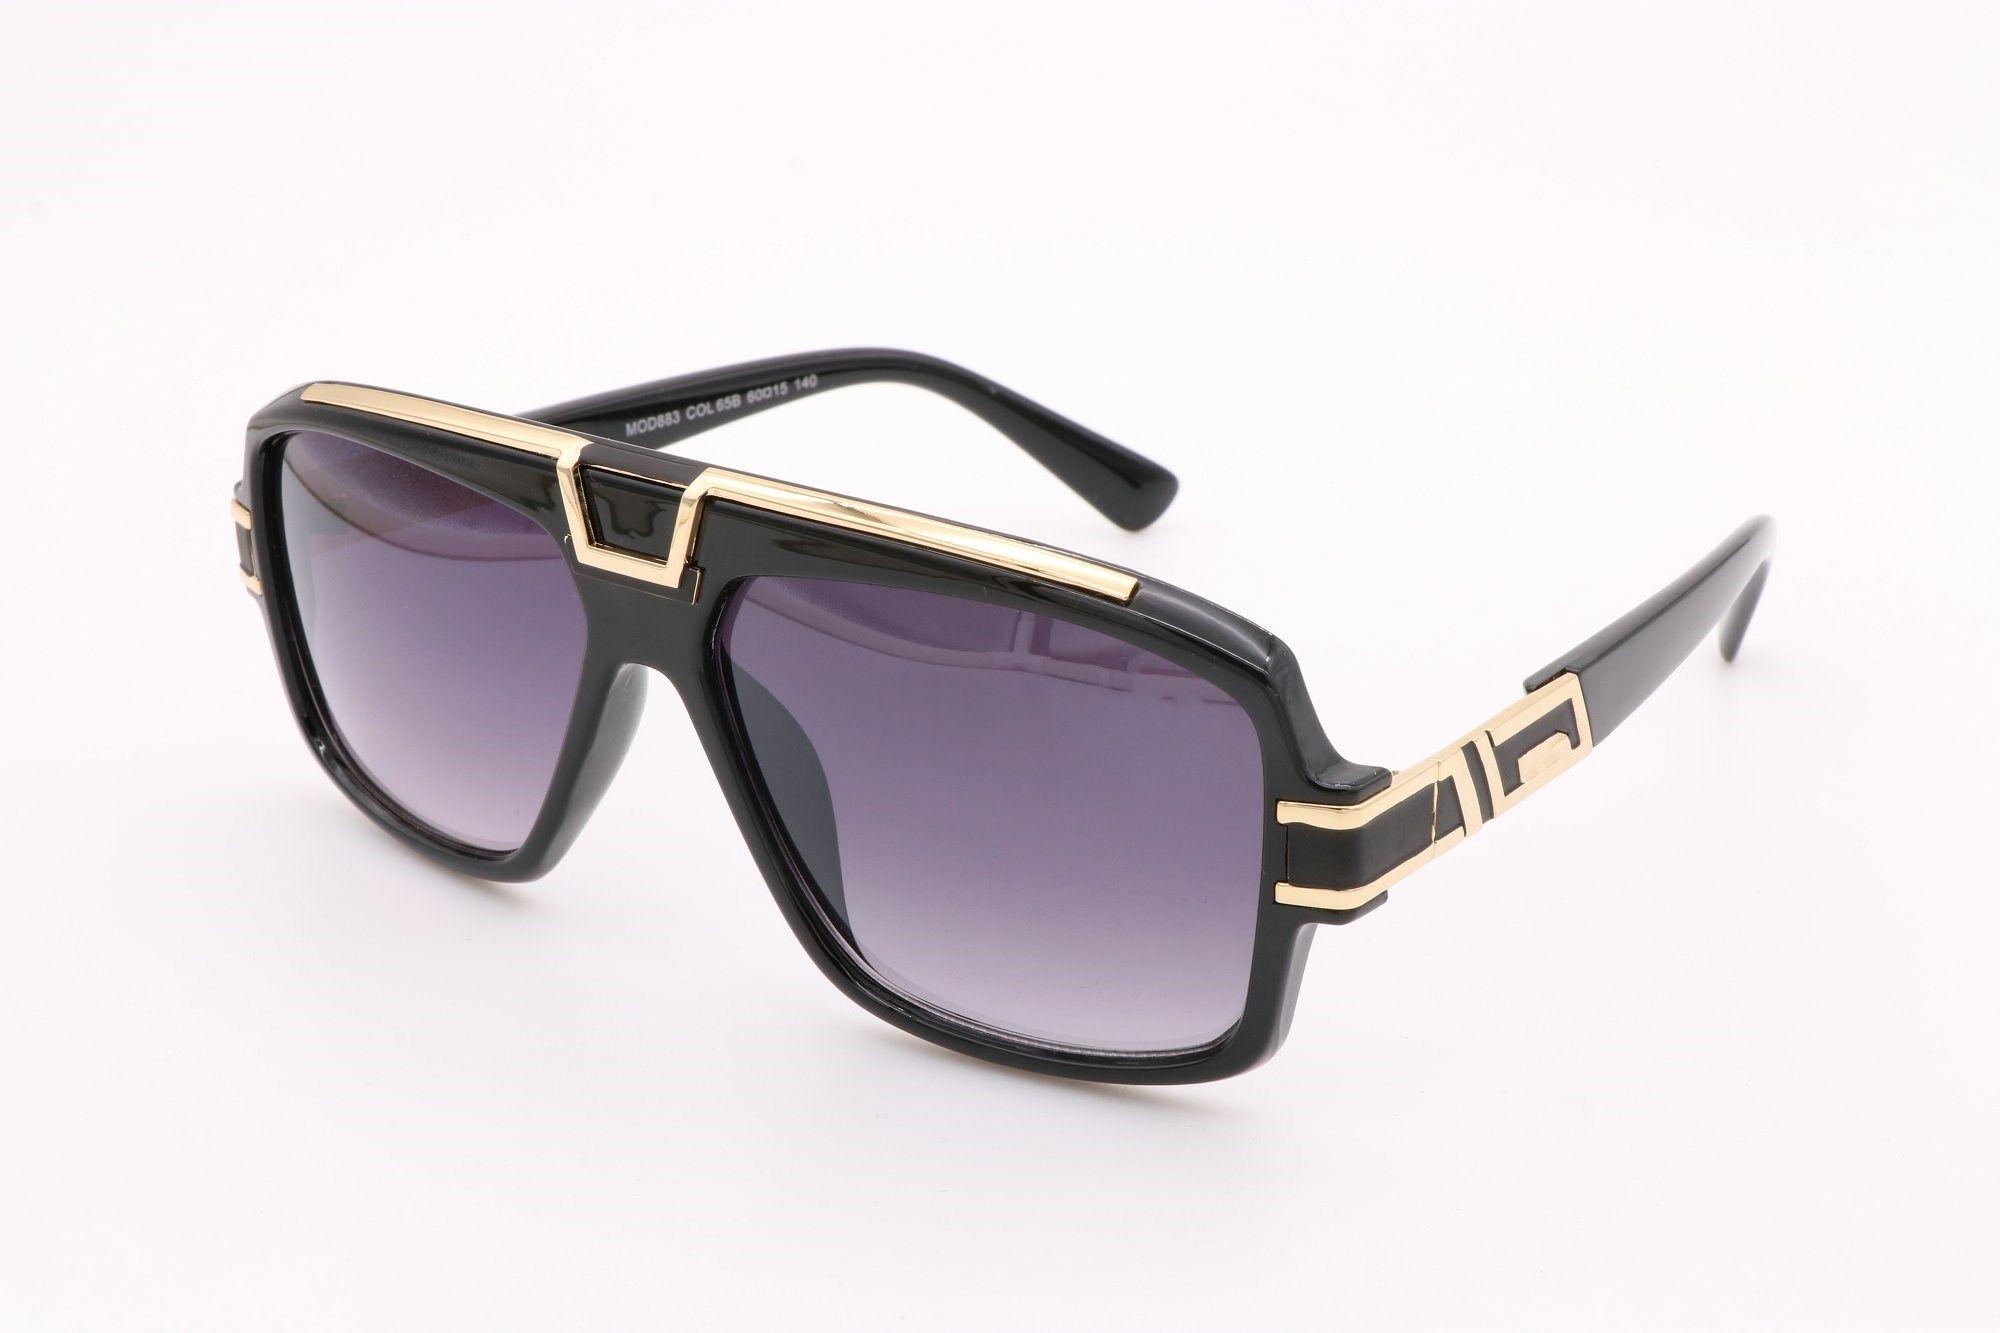 de67fa217fdc 883 Eyewear New Fashion Black Oversized Sunglasses Men Square Glasses For  Women Big Size Hip Hop Retro Sun Glasses Vintage Gafas Oculos John Lennon  ...